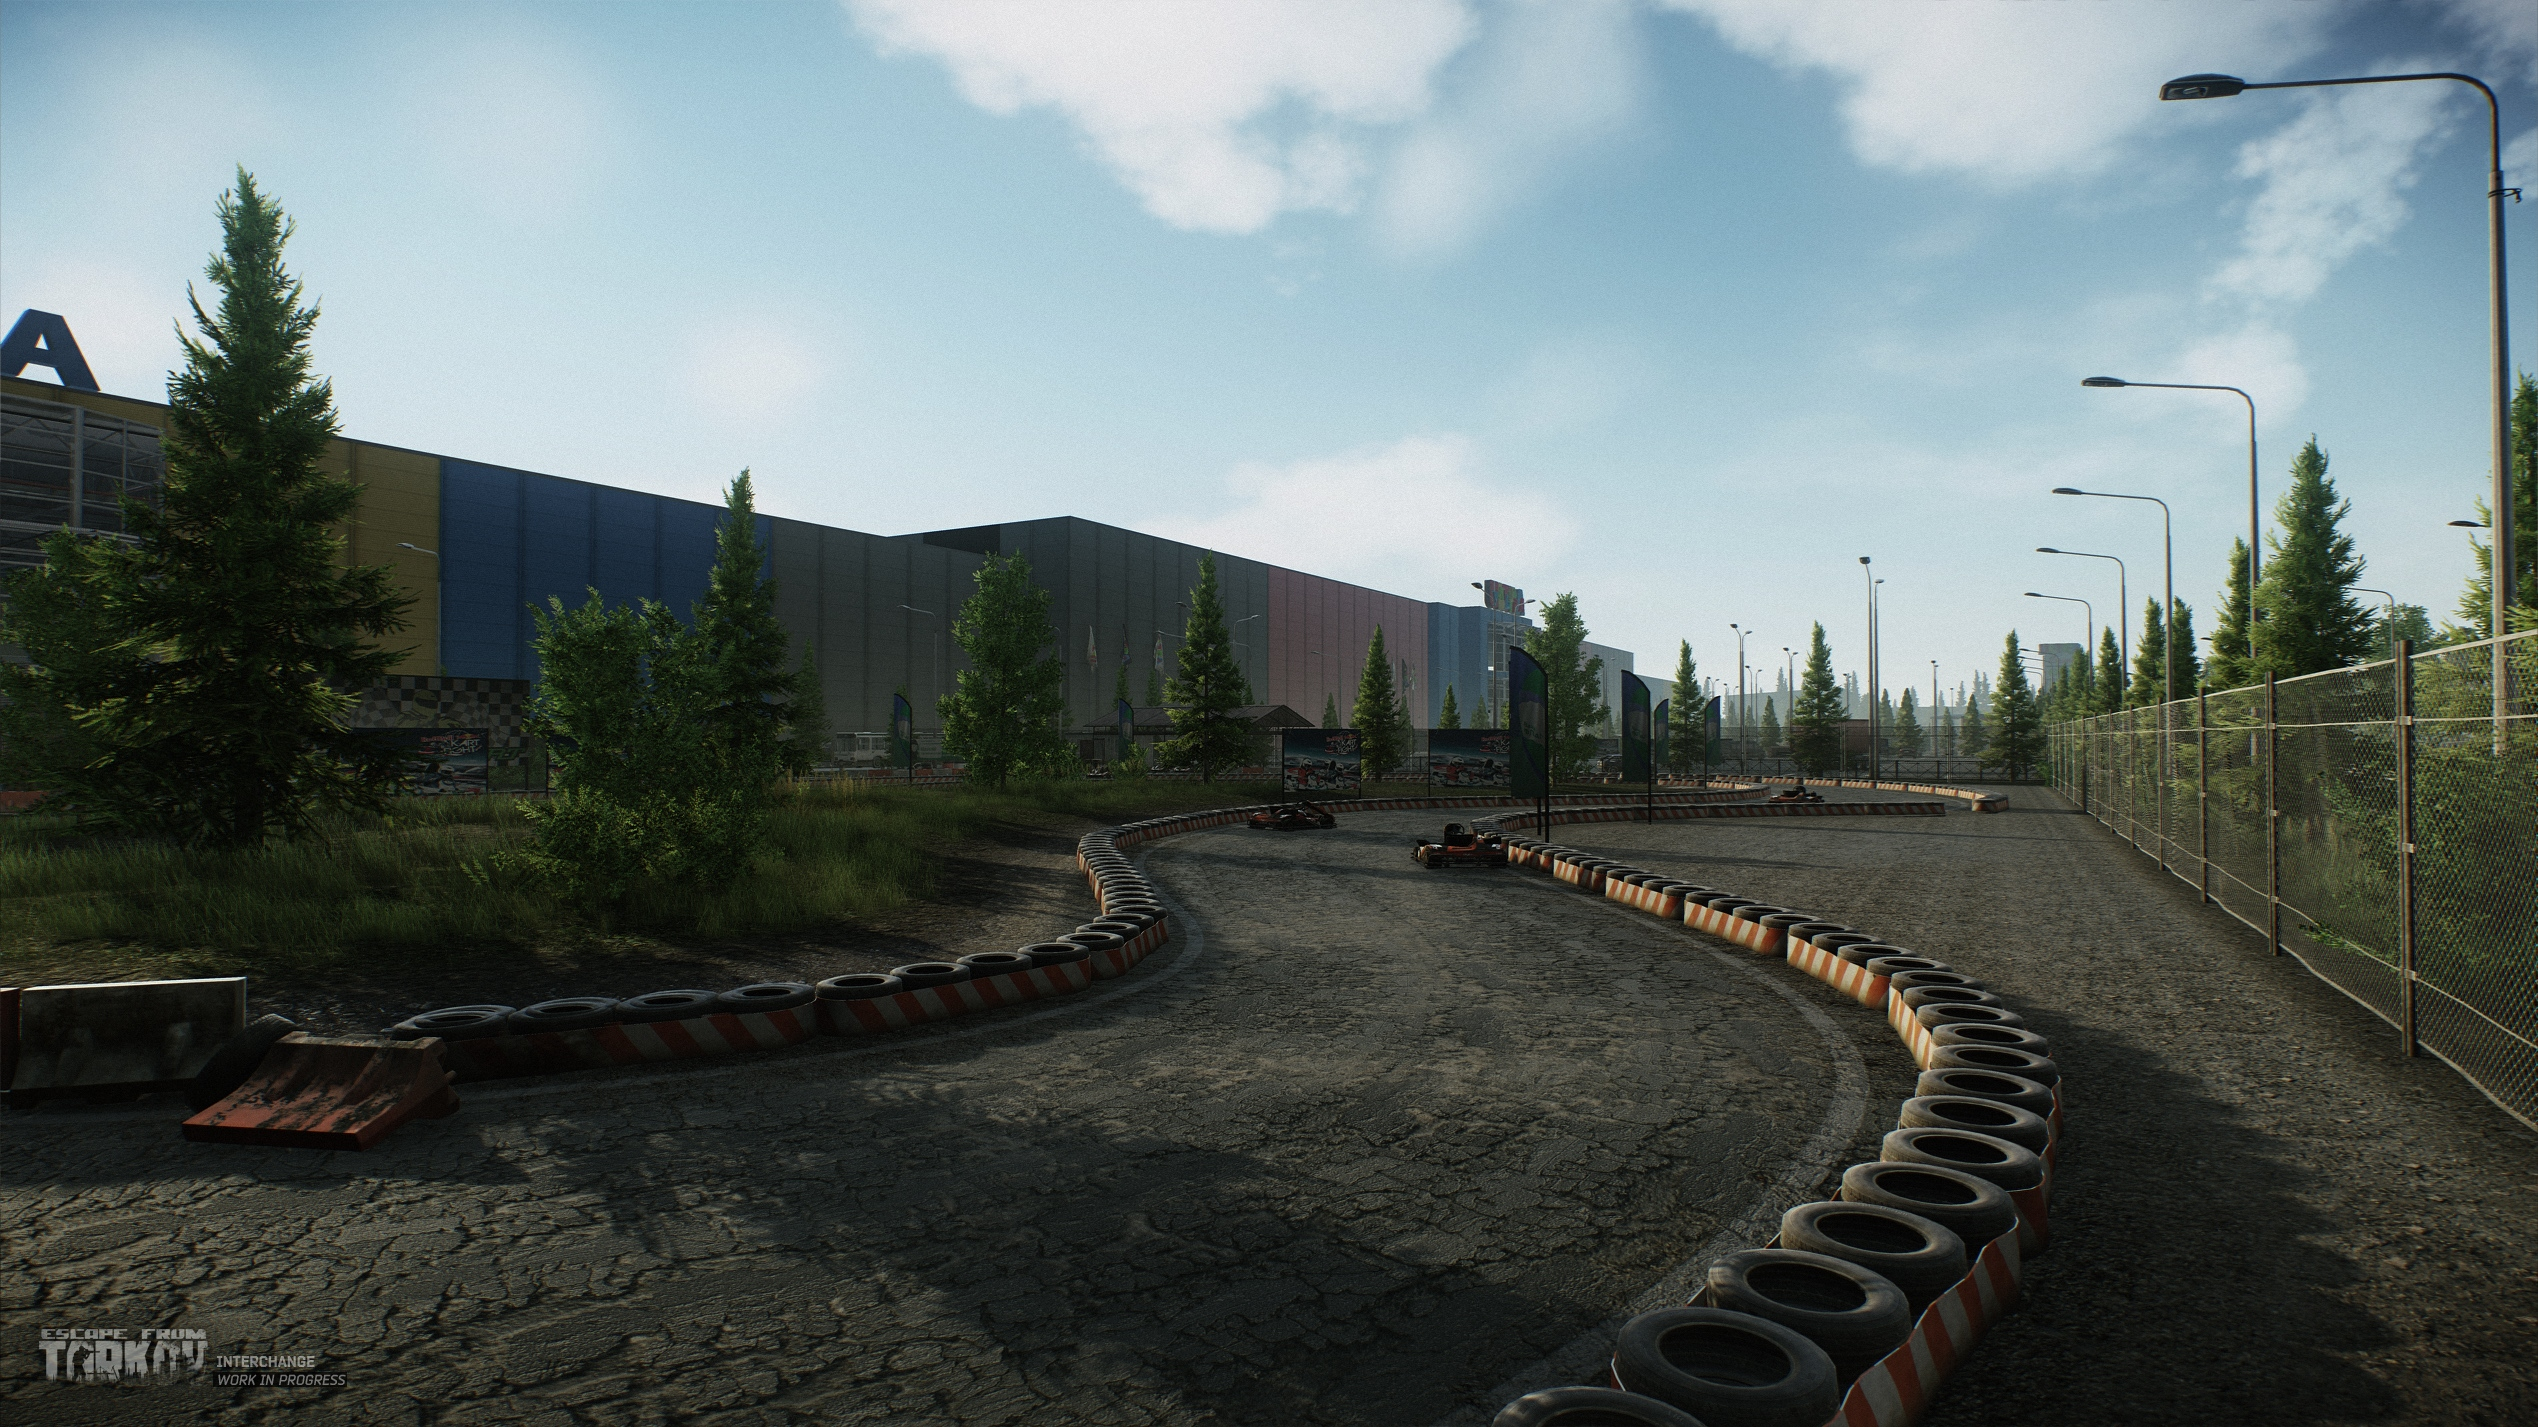 Escape from tarkov servers